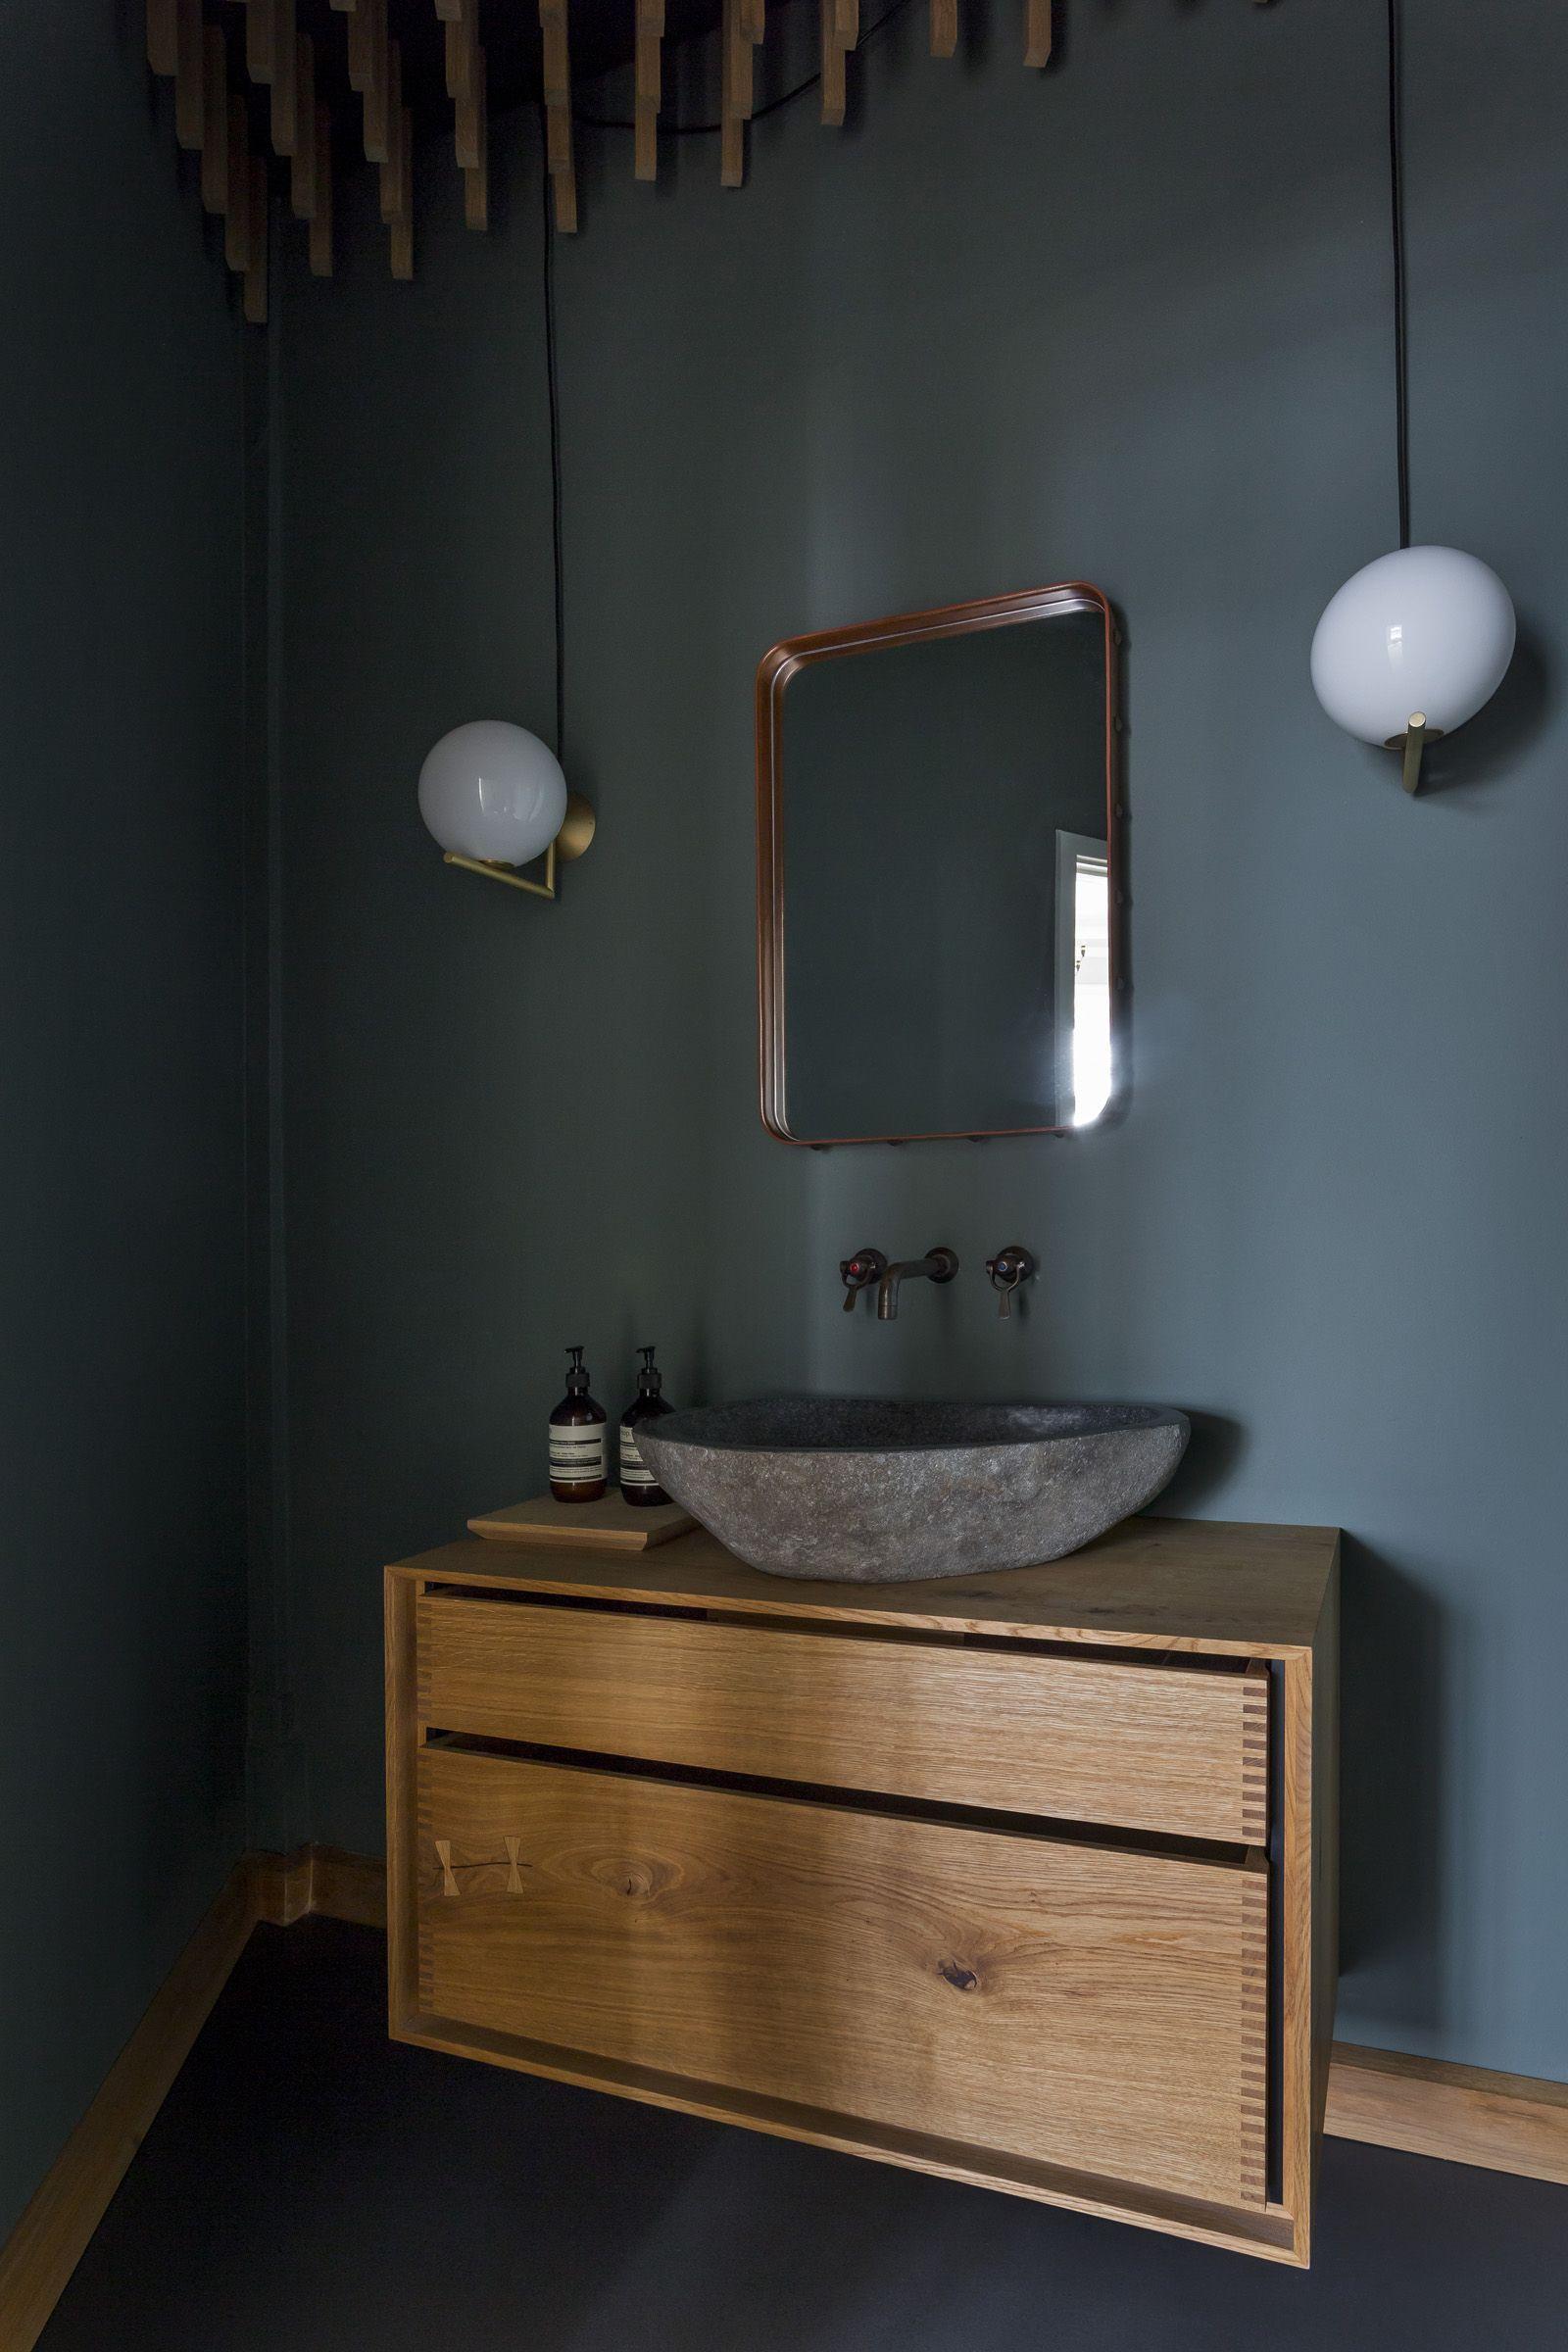 Model Dinesen Wooden Bathroom Furniture, Made To Measure Bathroom Cabinets